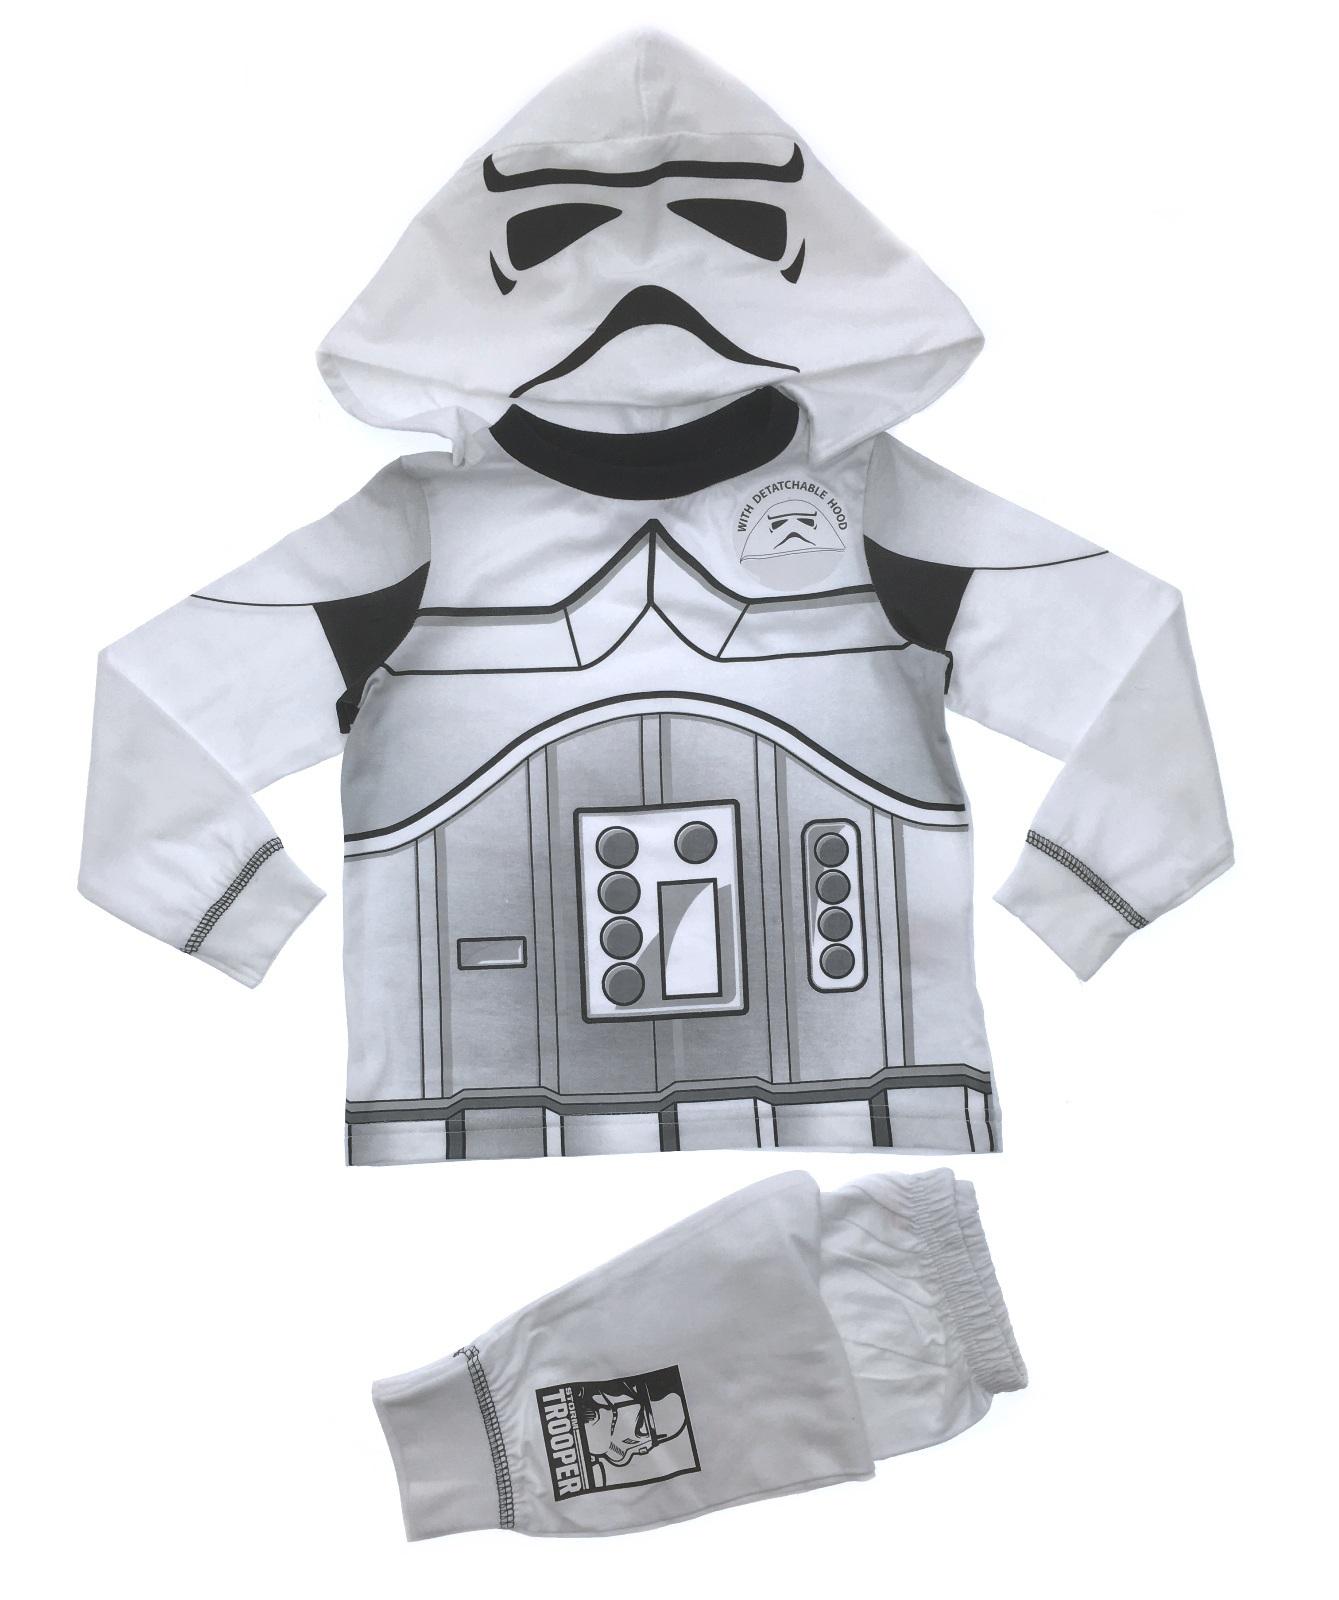 Kids Star Wars Pjs Novelty Fancy Dress Up Pyjamas 100% ...